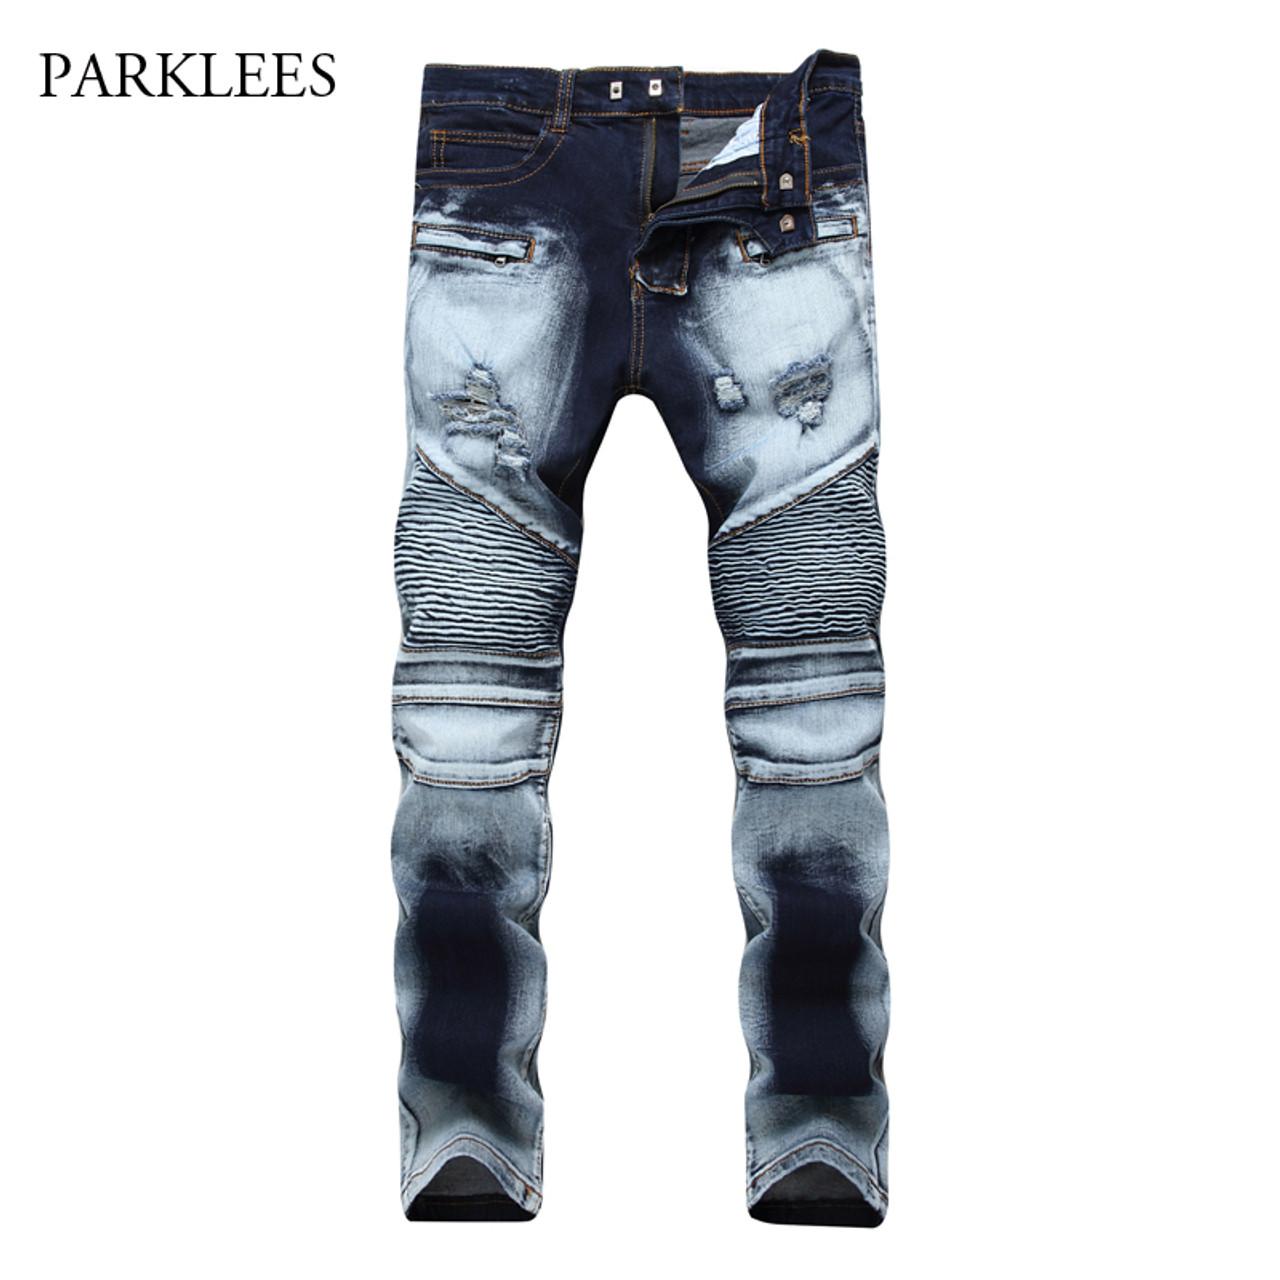 21611efcba Brand Biker Jeans Men 2017 Autumn Casual Washed Cotton Fold Skinny Ripped  Jeans Hip Hop Elasticity Slim Denim Jeans Pants Homme - OnshopDeals.Com